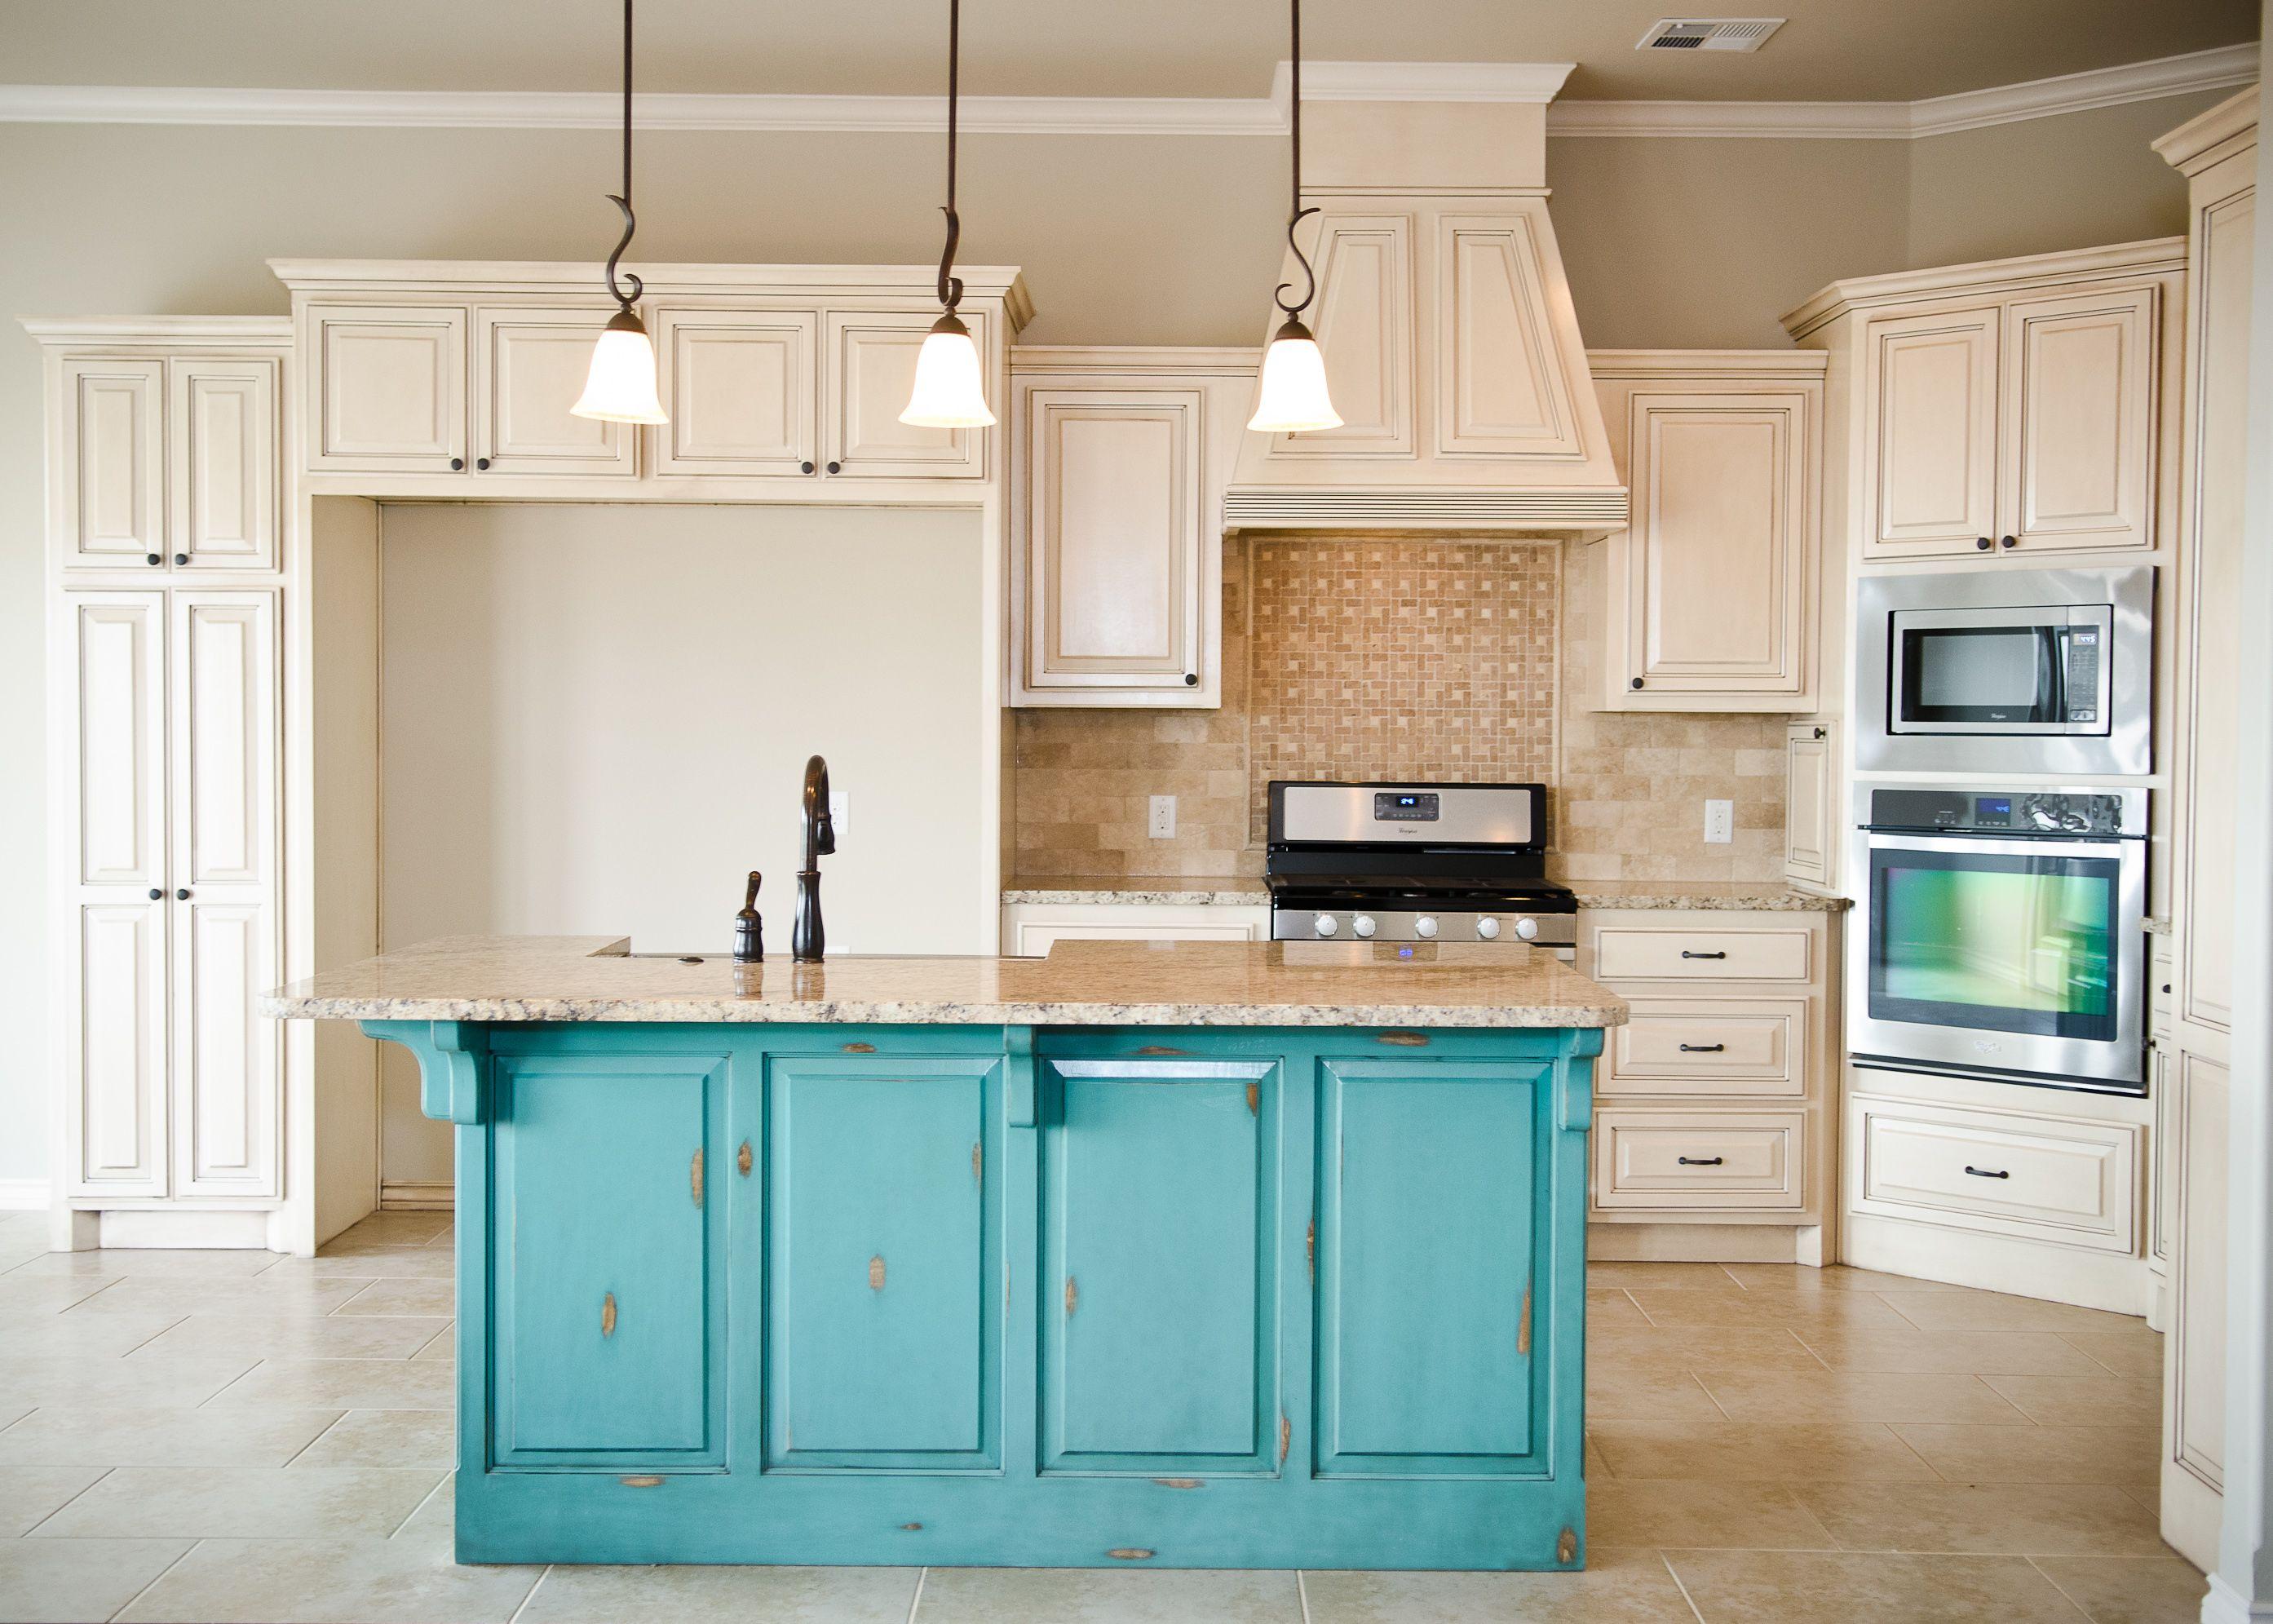 distressed kitchen island ge appliance packages turquoise with cream glazed cabinets stone mosaic backsplash